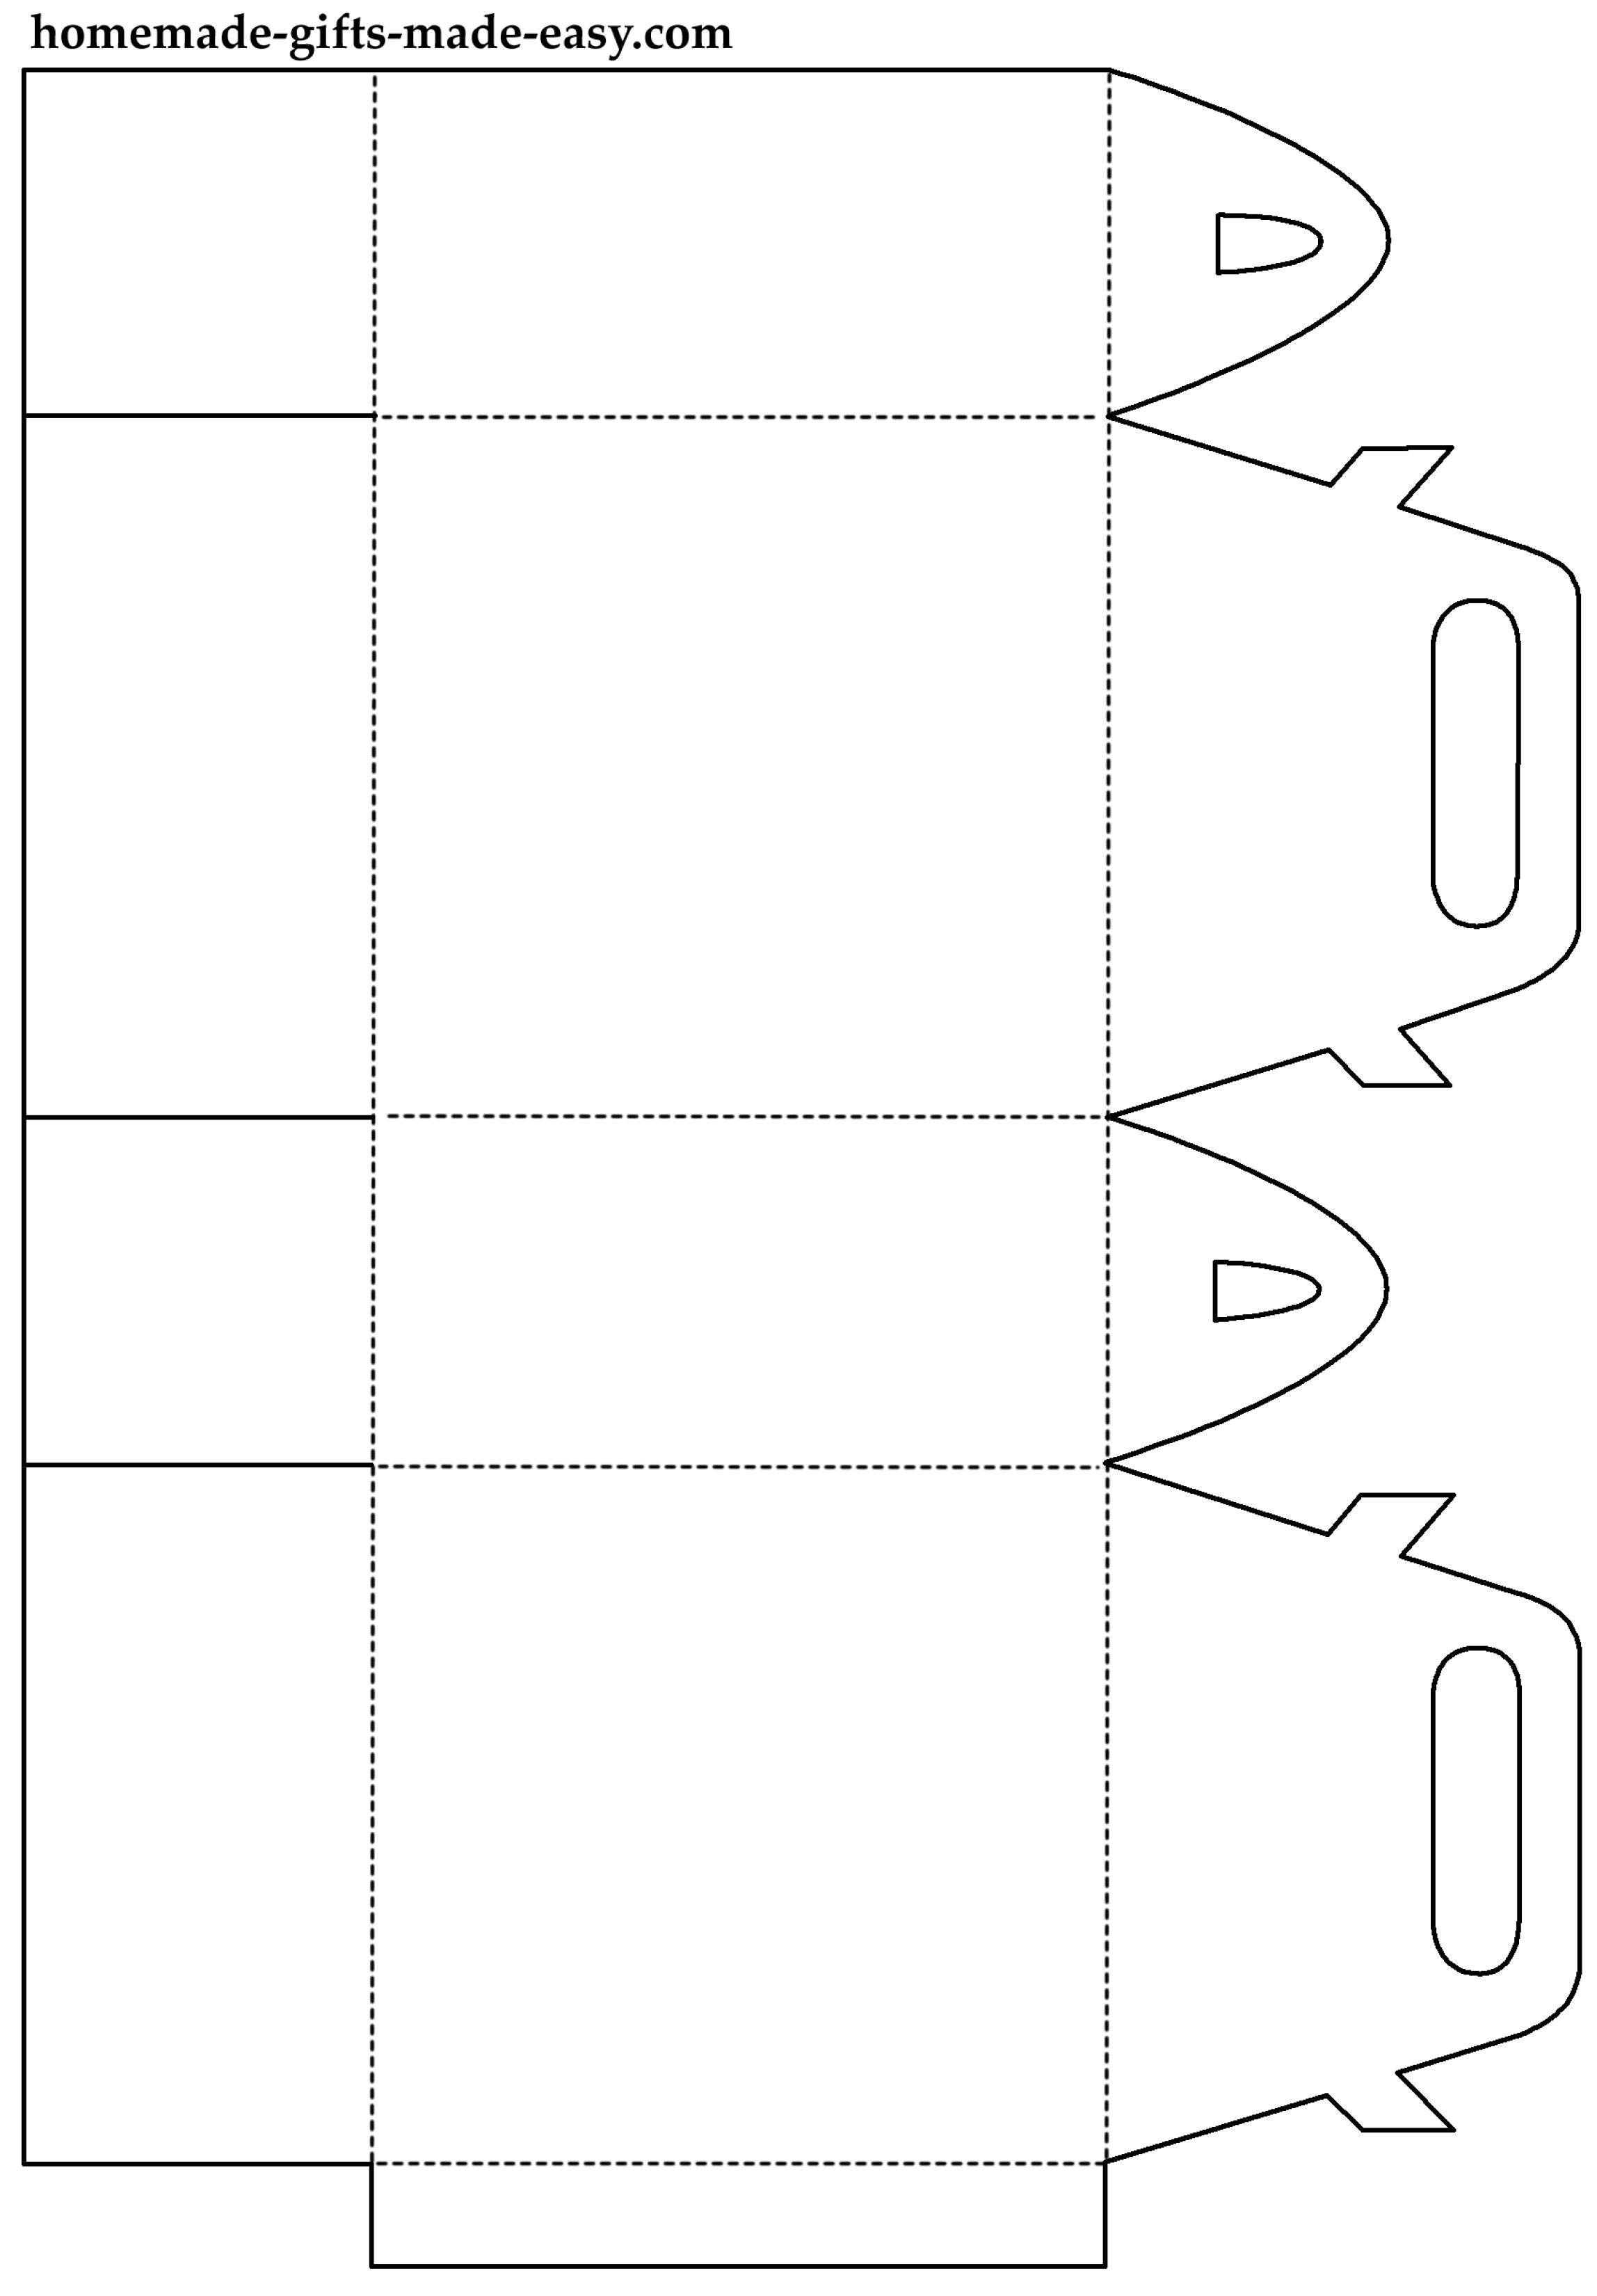 коробки своими руками из бумаги схема